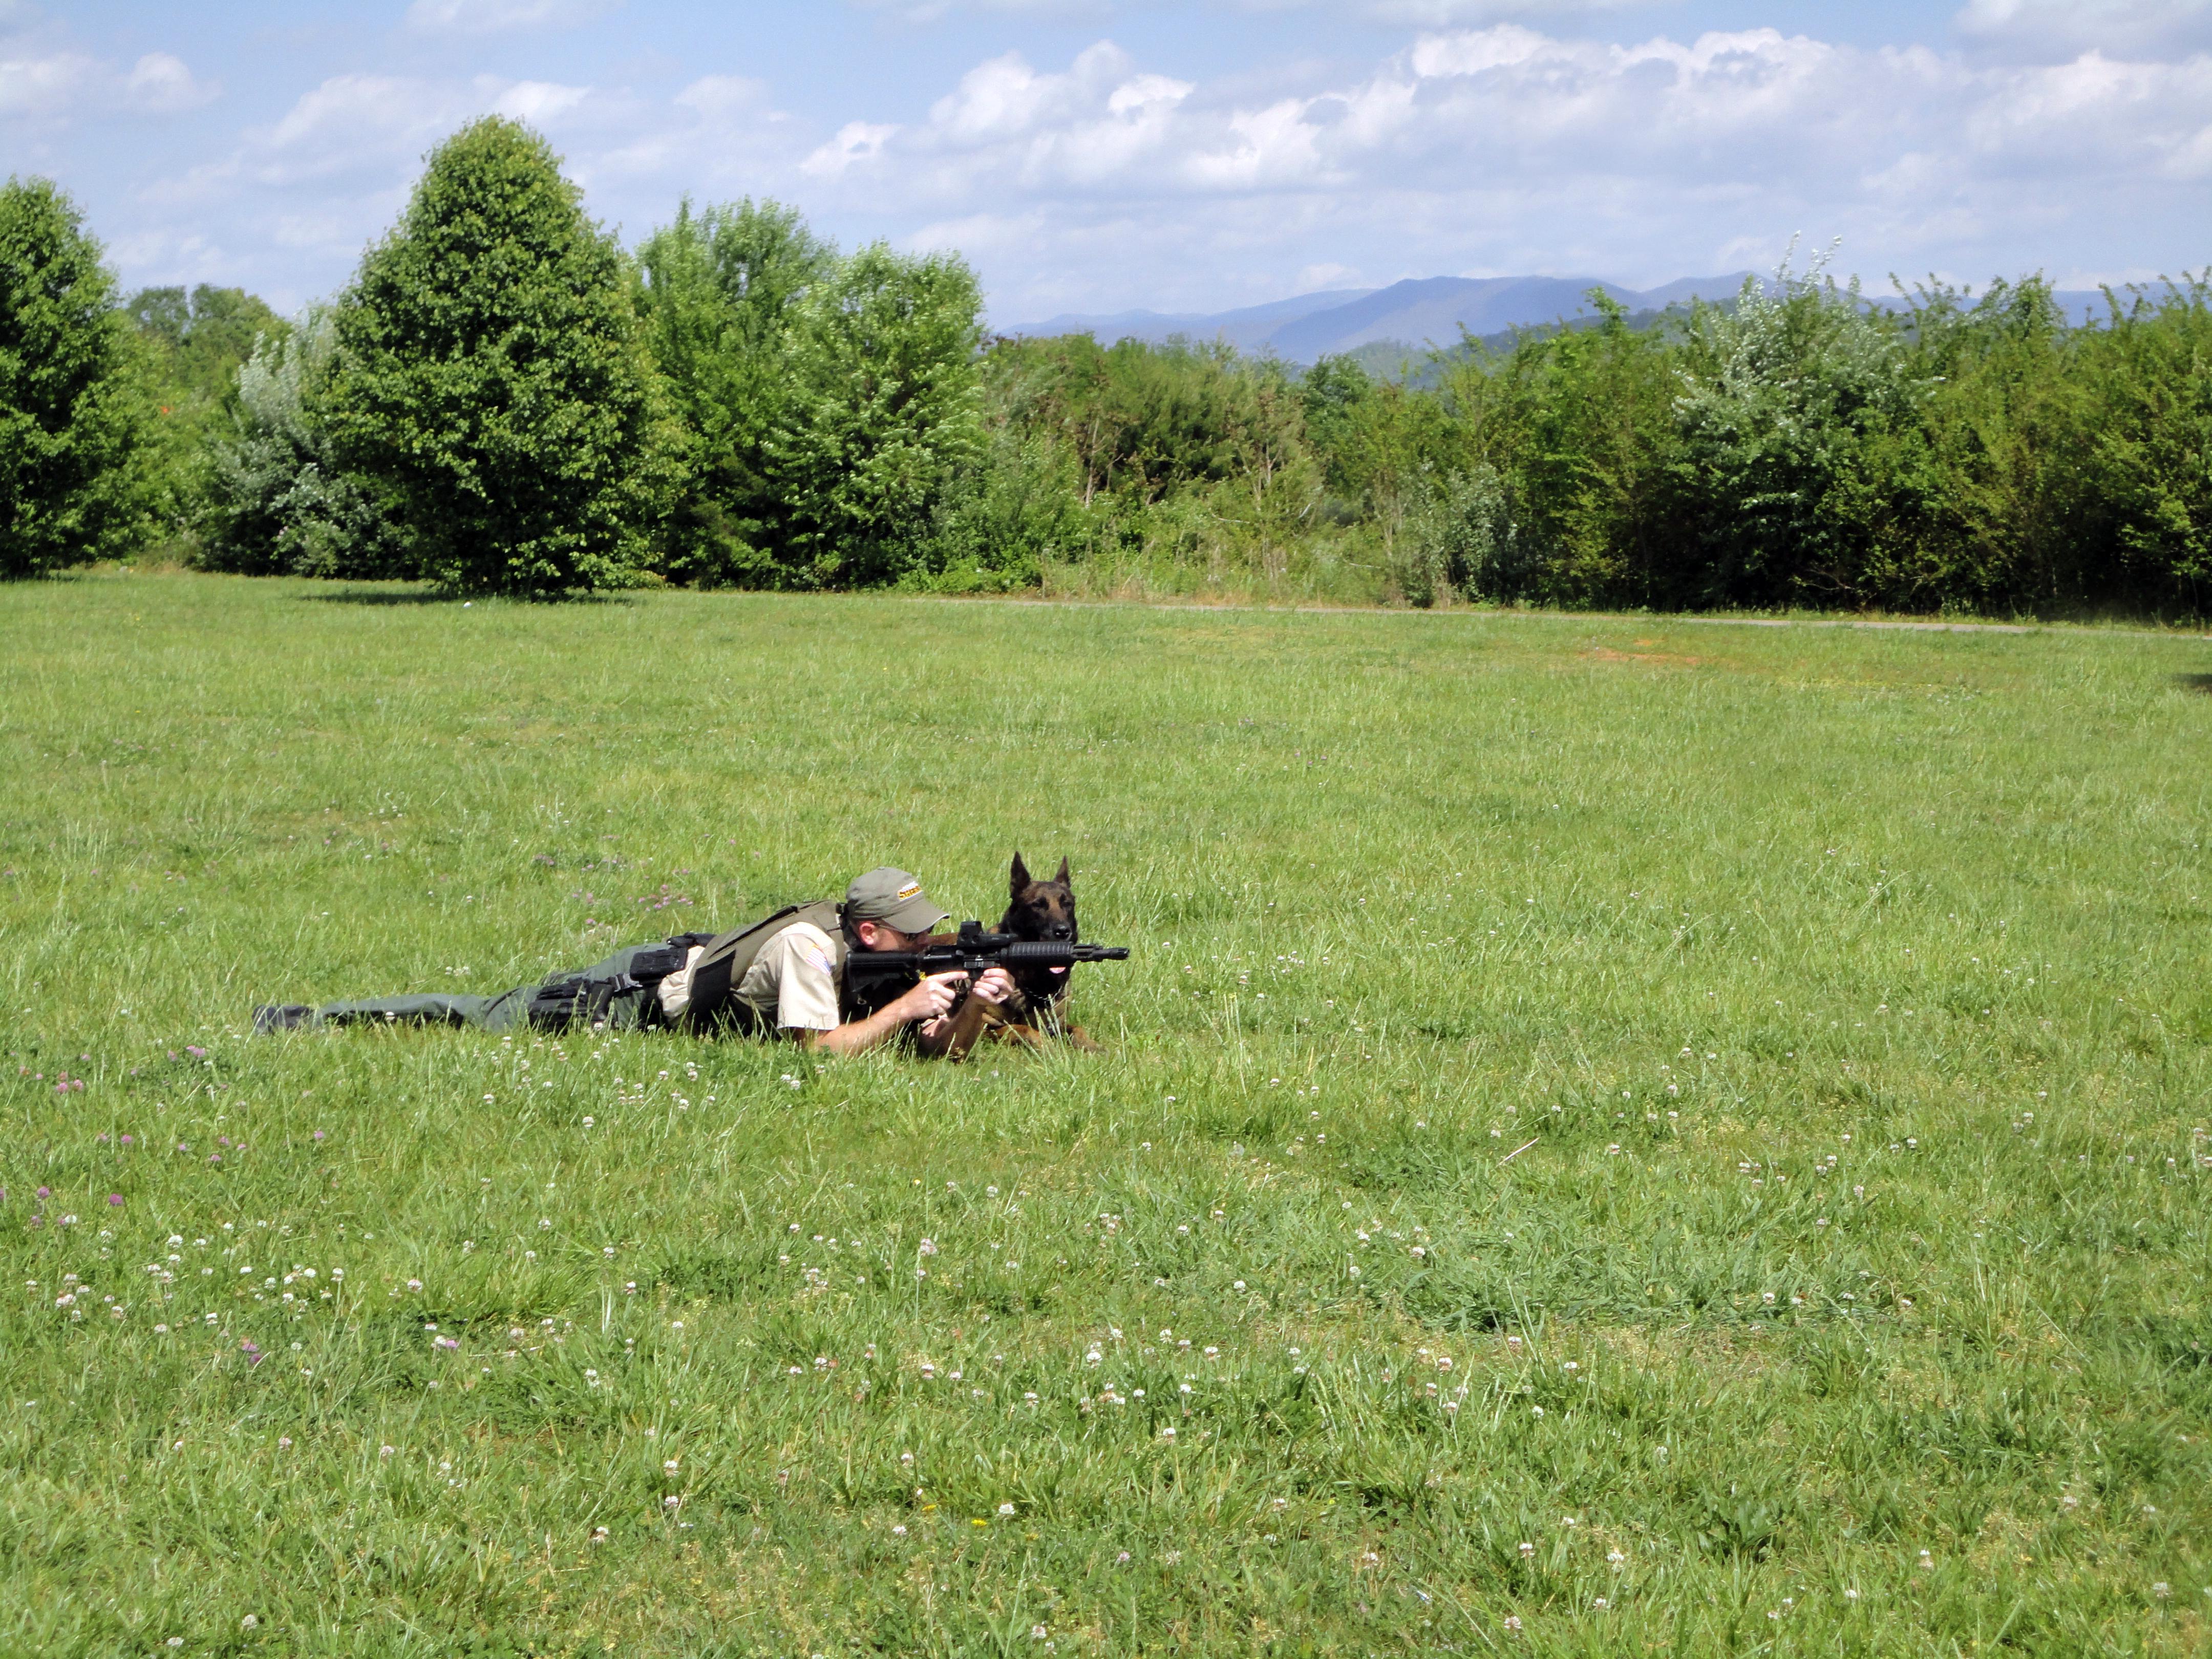 Clint Eros on ground